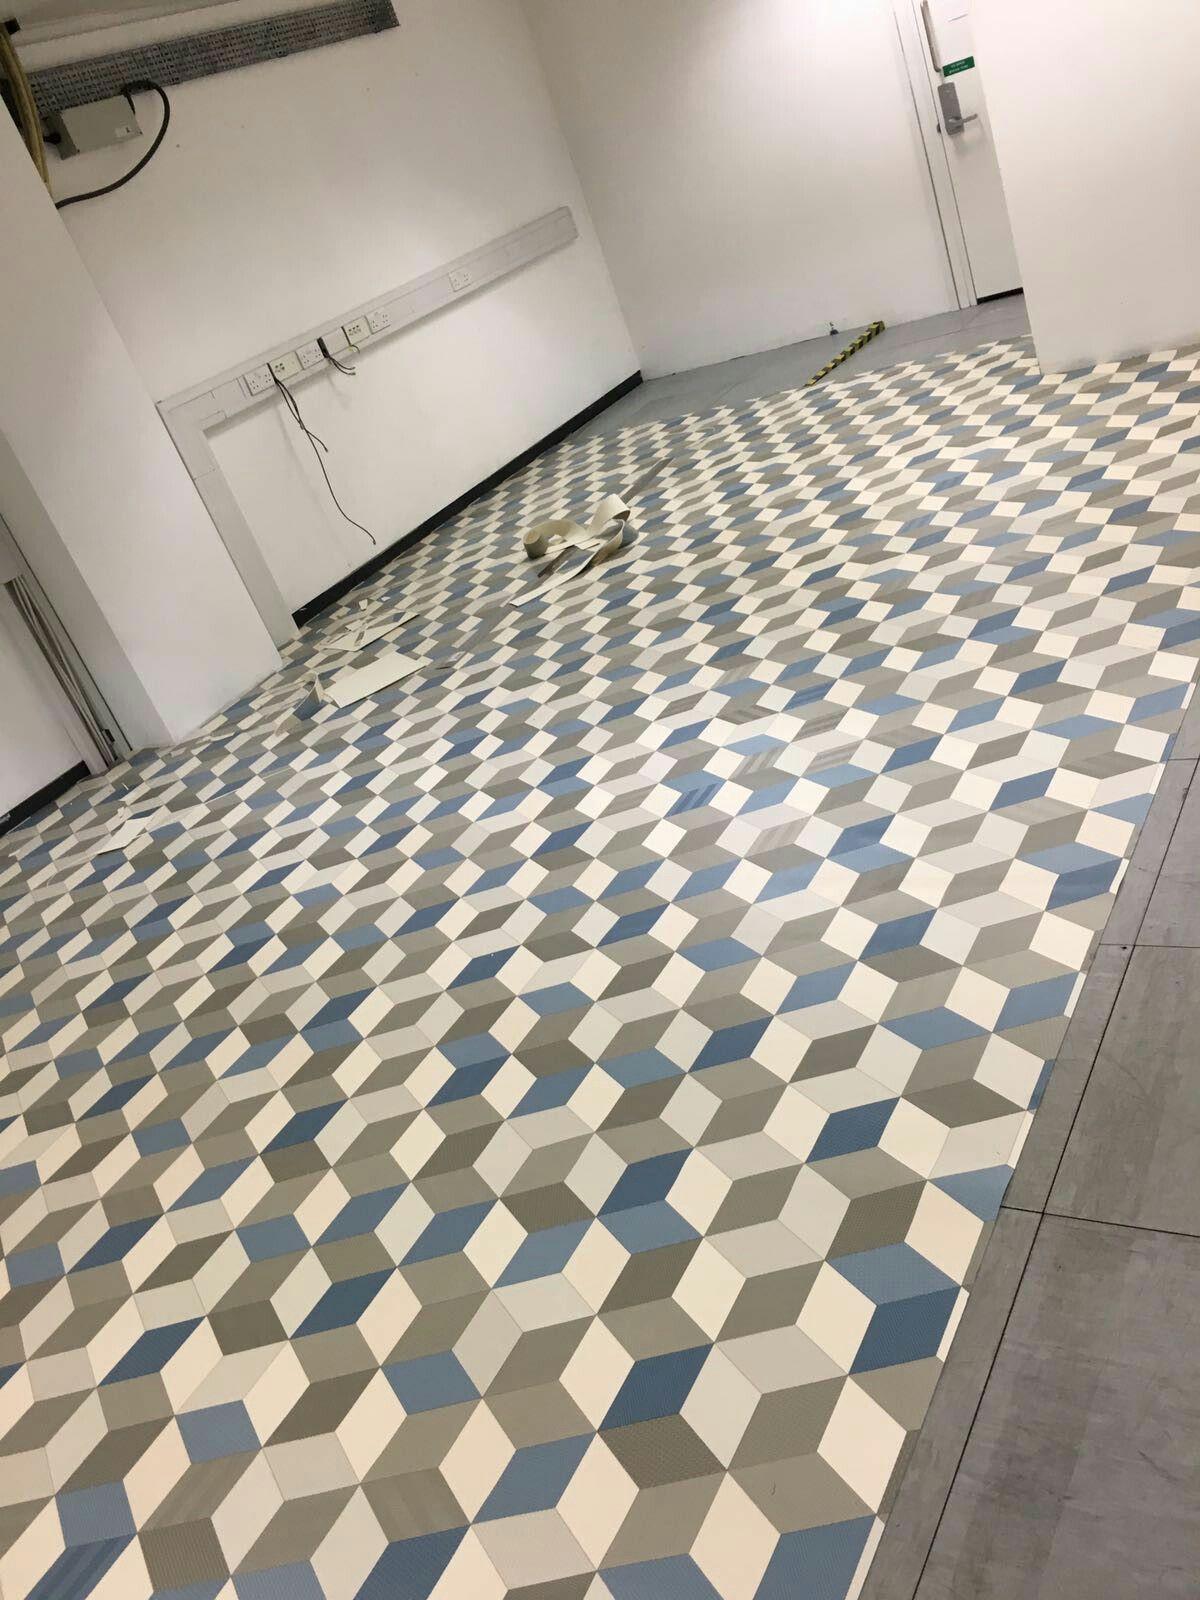 Patterned Vinyl Flooring Magnificent Inspiration Design